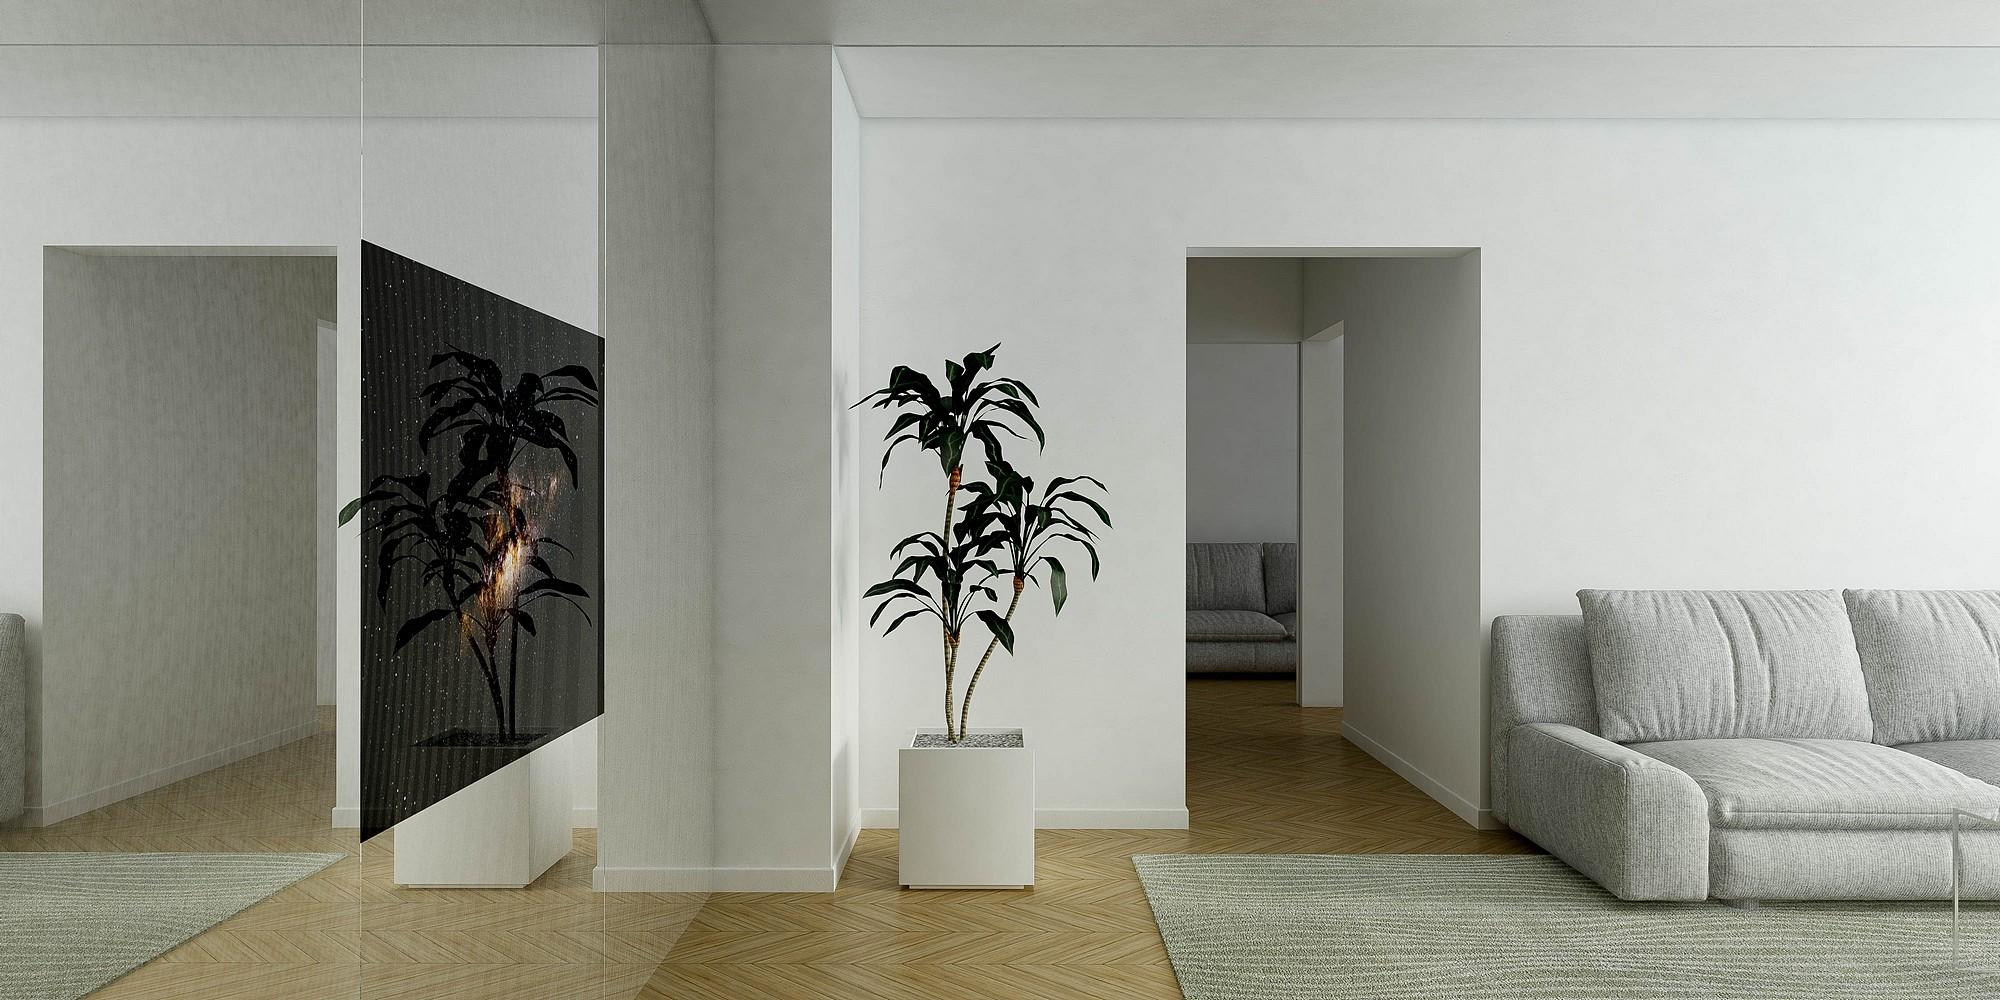 Enterijer-stan-Andreu-Beograd-Studio-Alfirevic-arhitektura-arhitekta-03